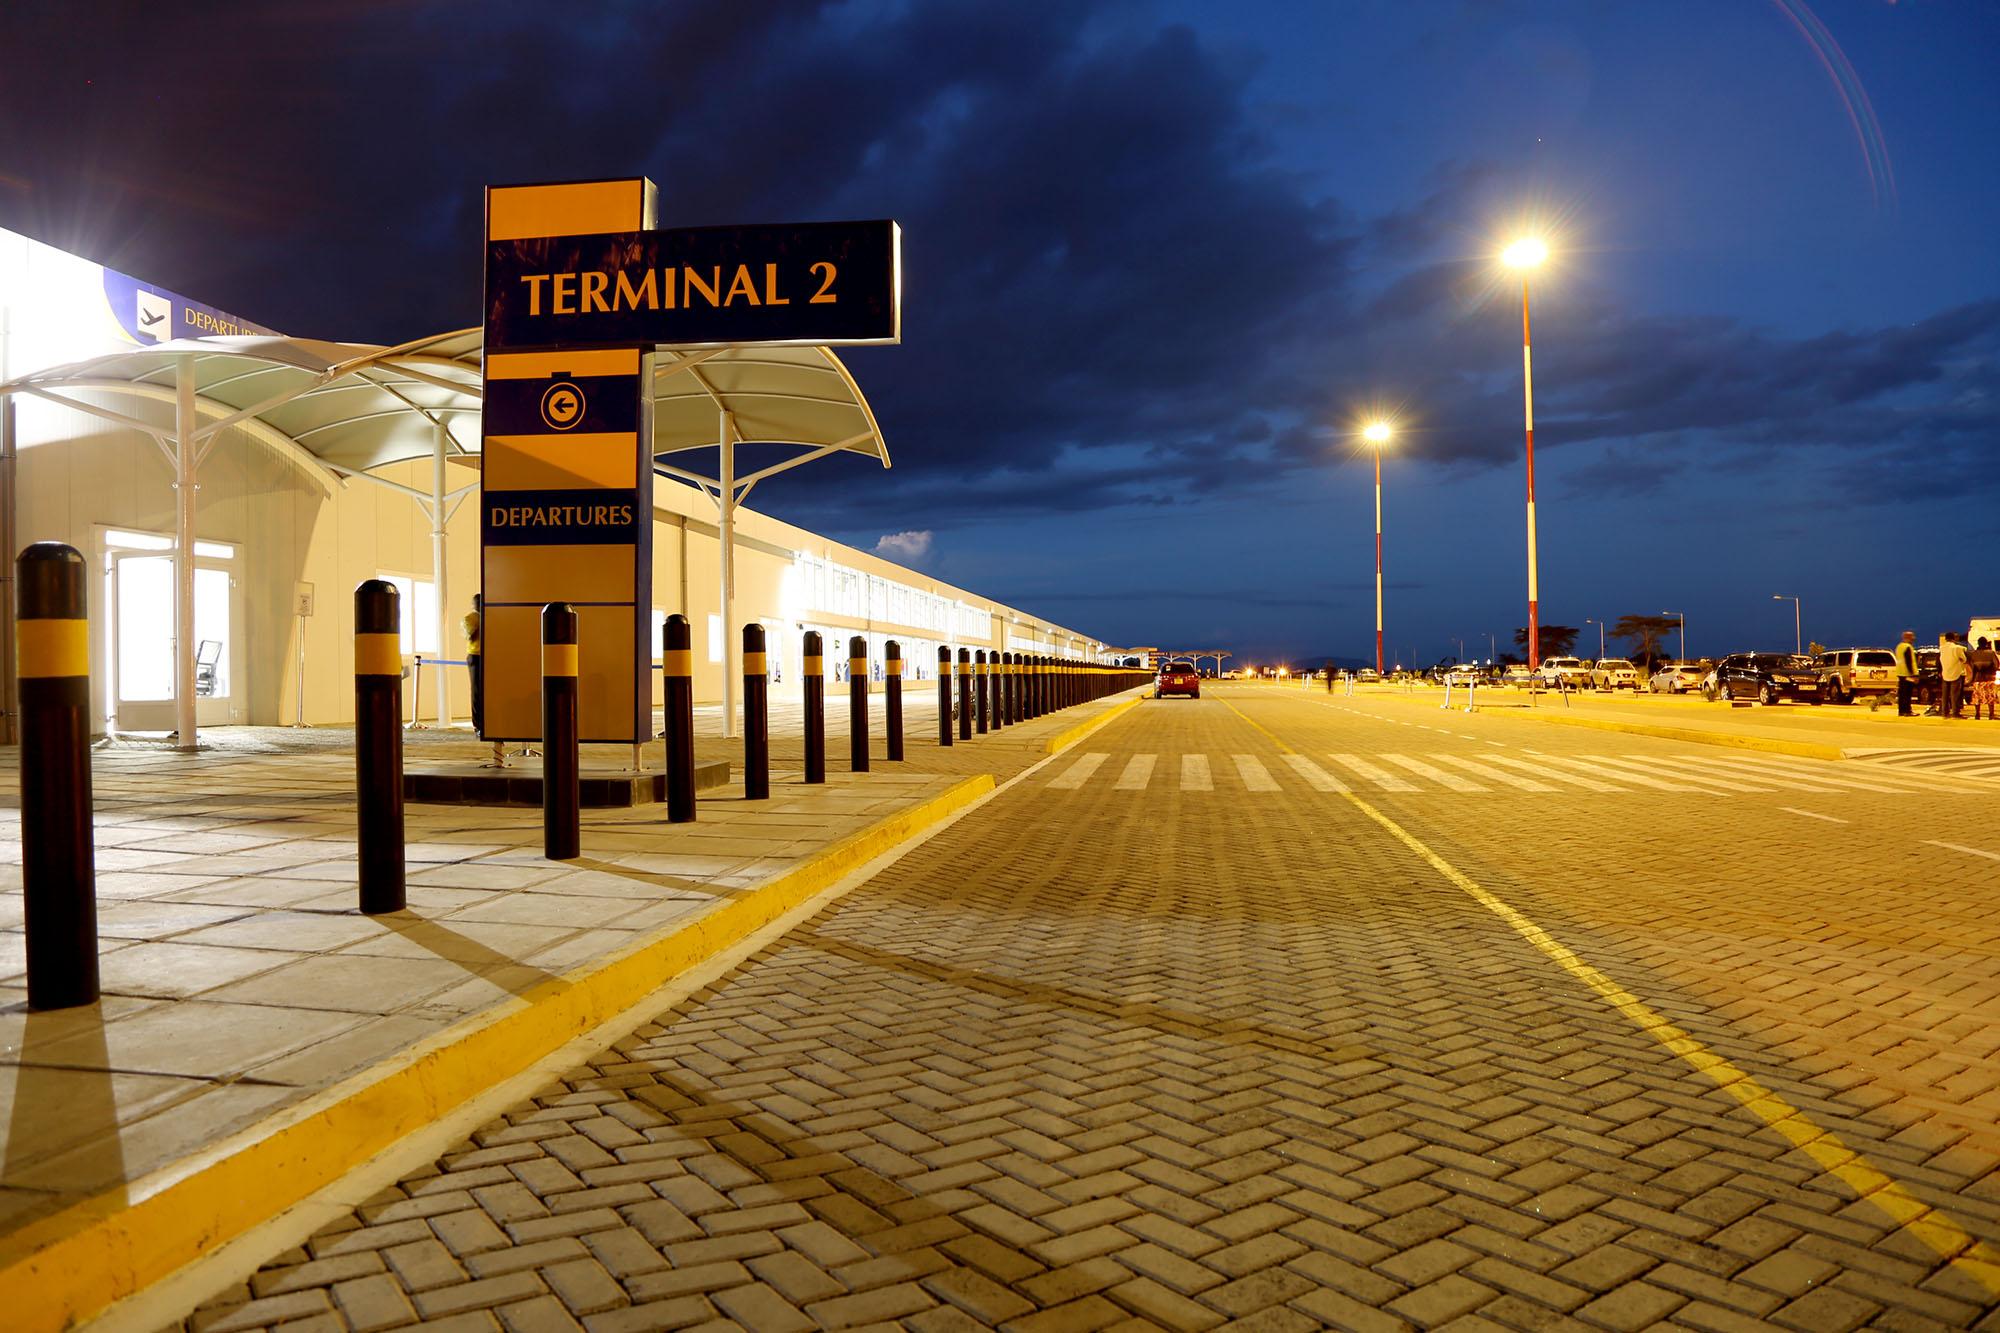 Kenya Airports Authority : Cargo at JKIA